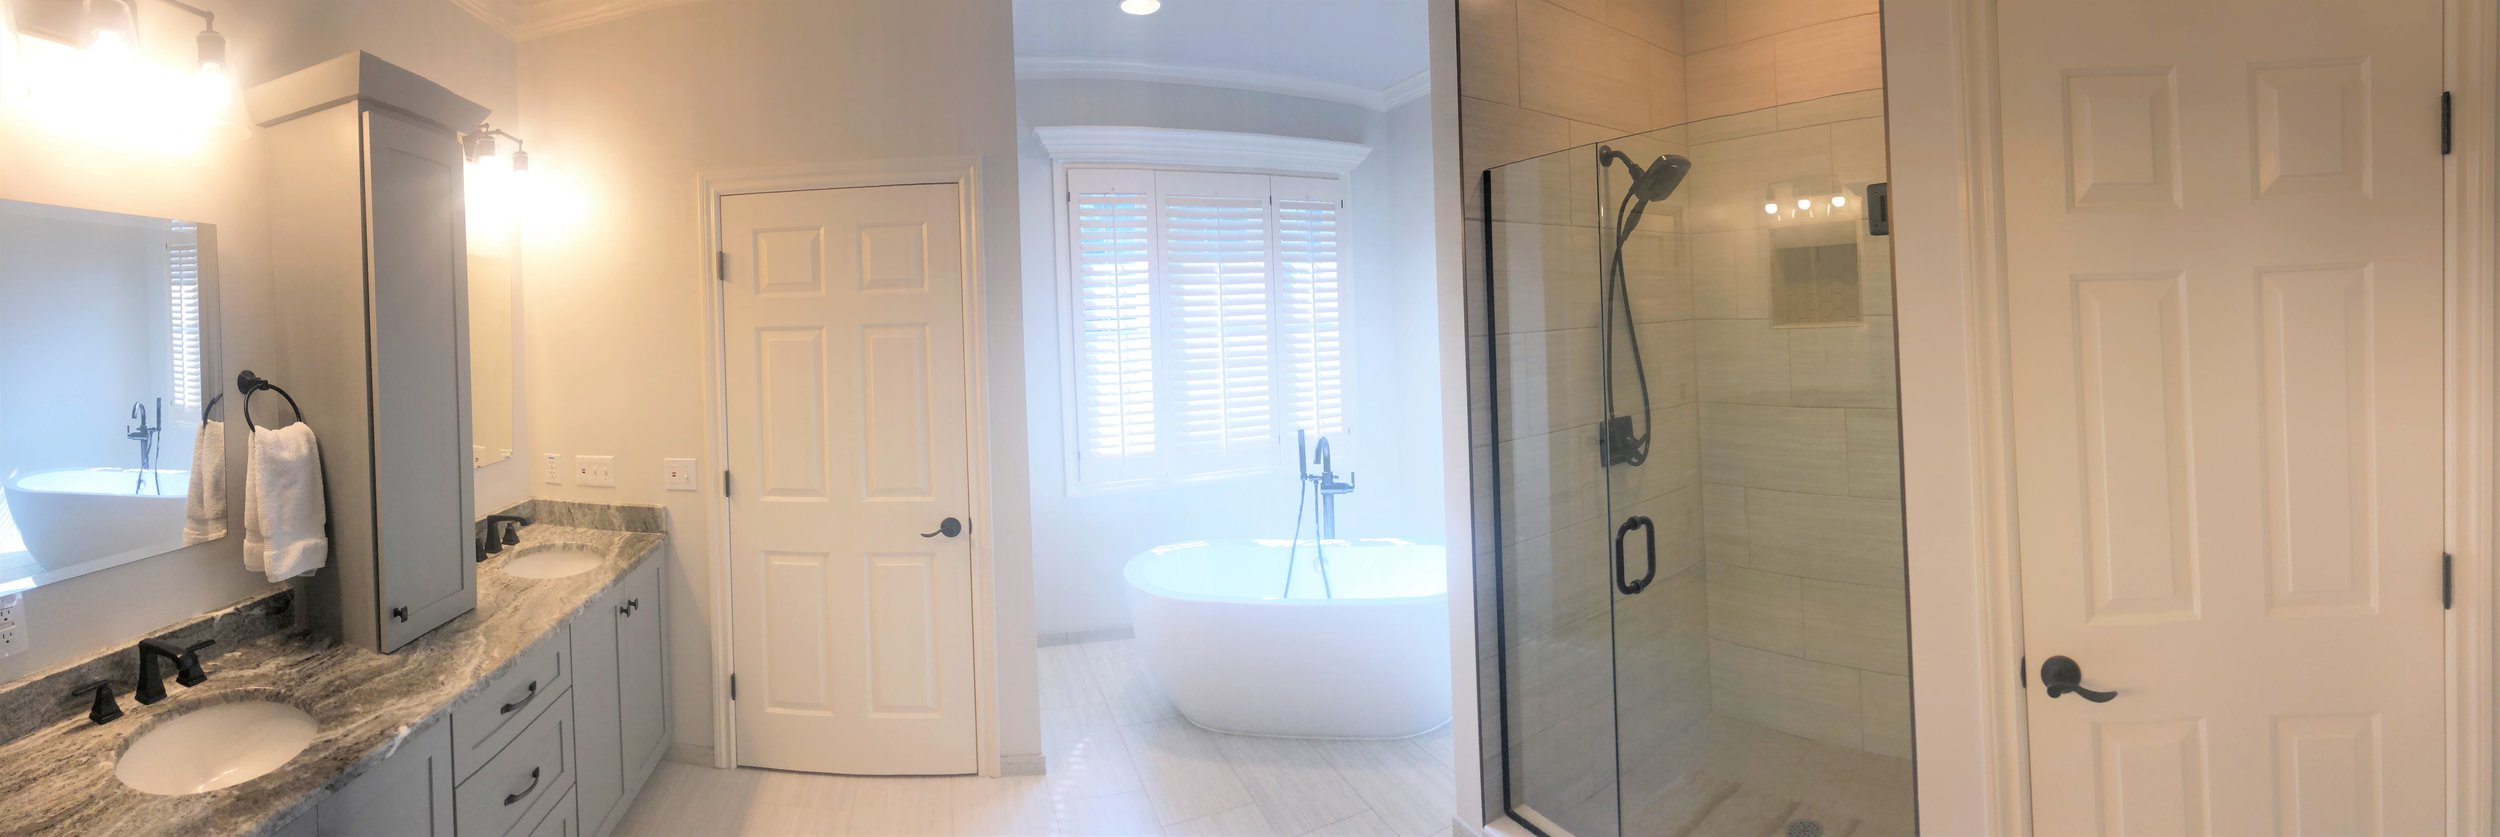 Complete bathroom renovation.jpg